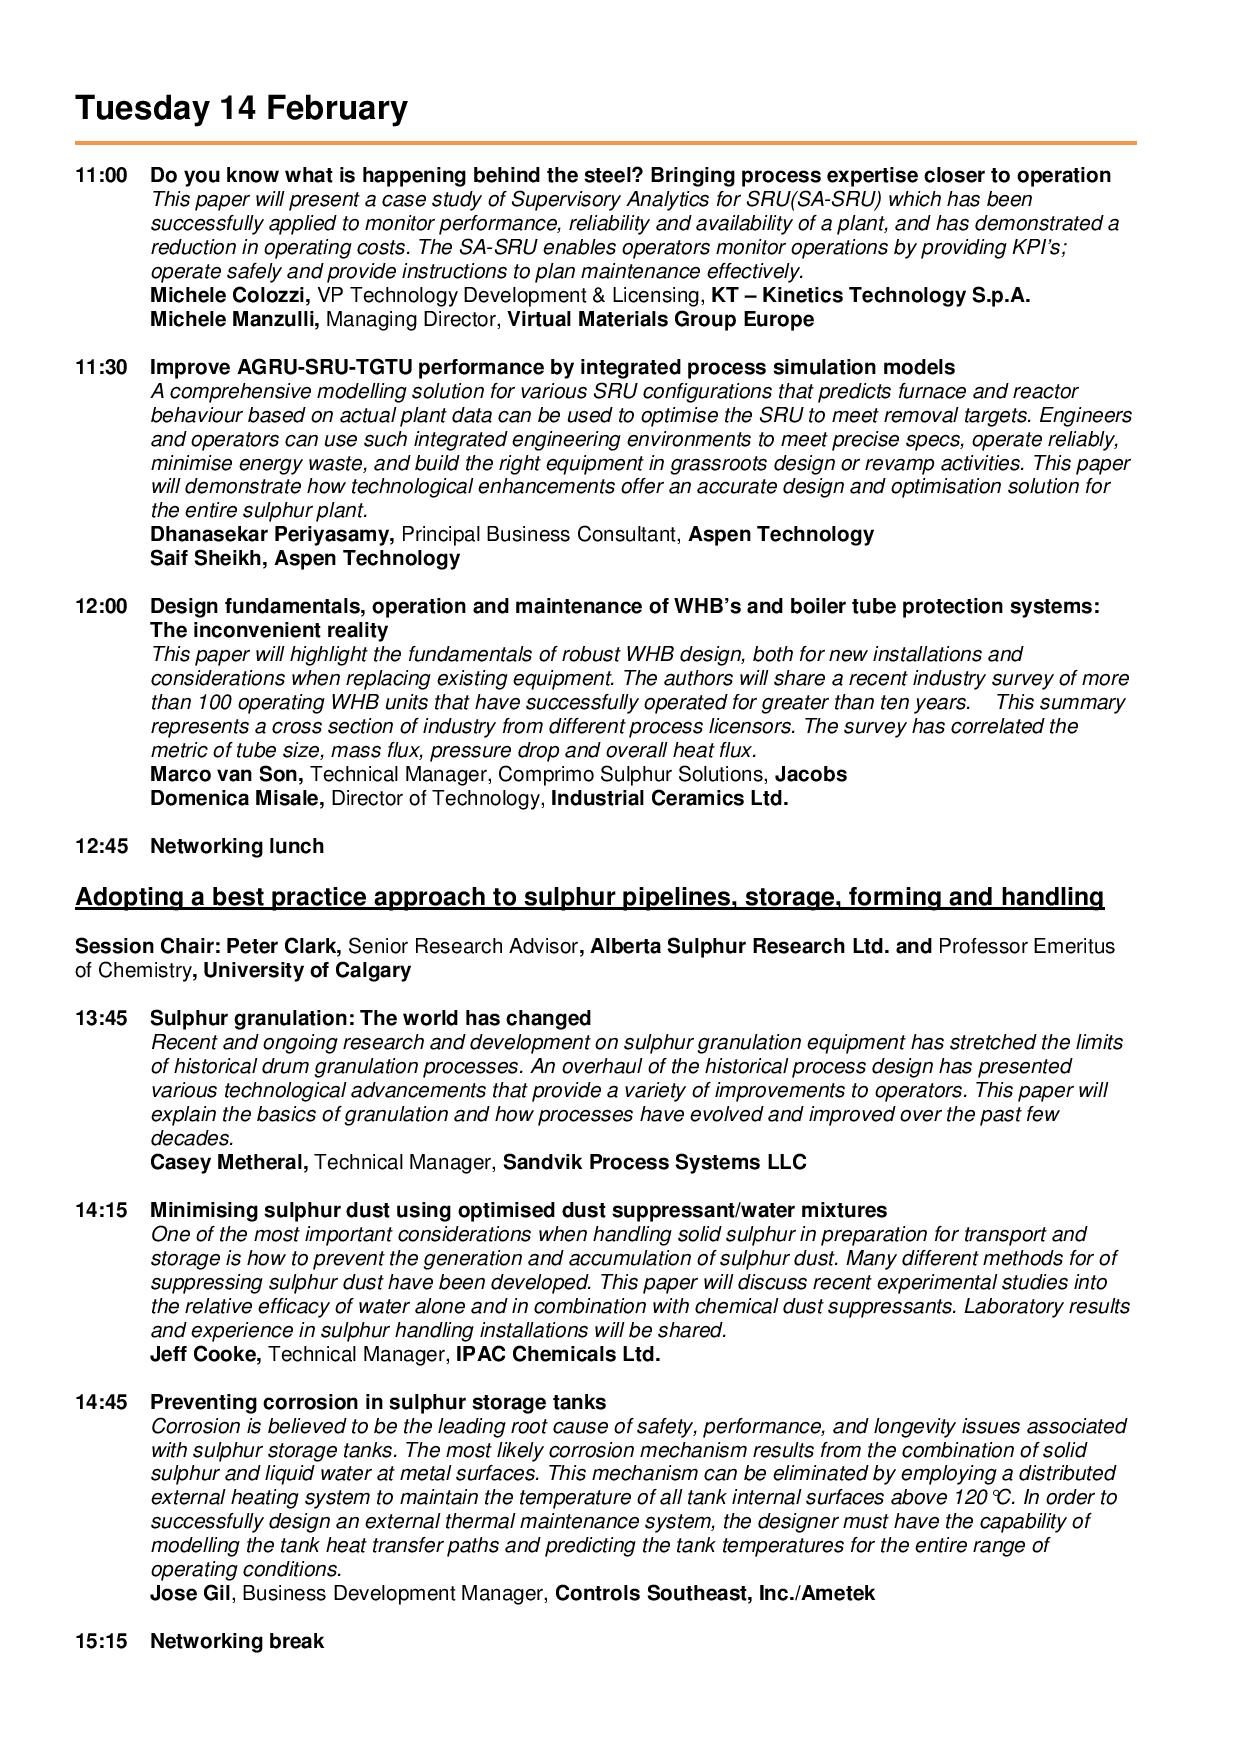 SUME4_-_Agenda_1_-_USE-page-005